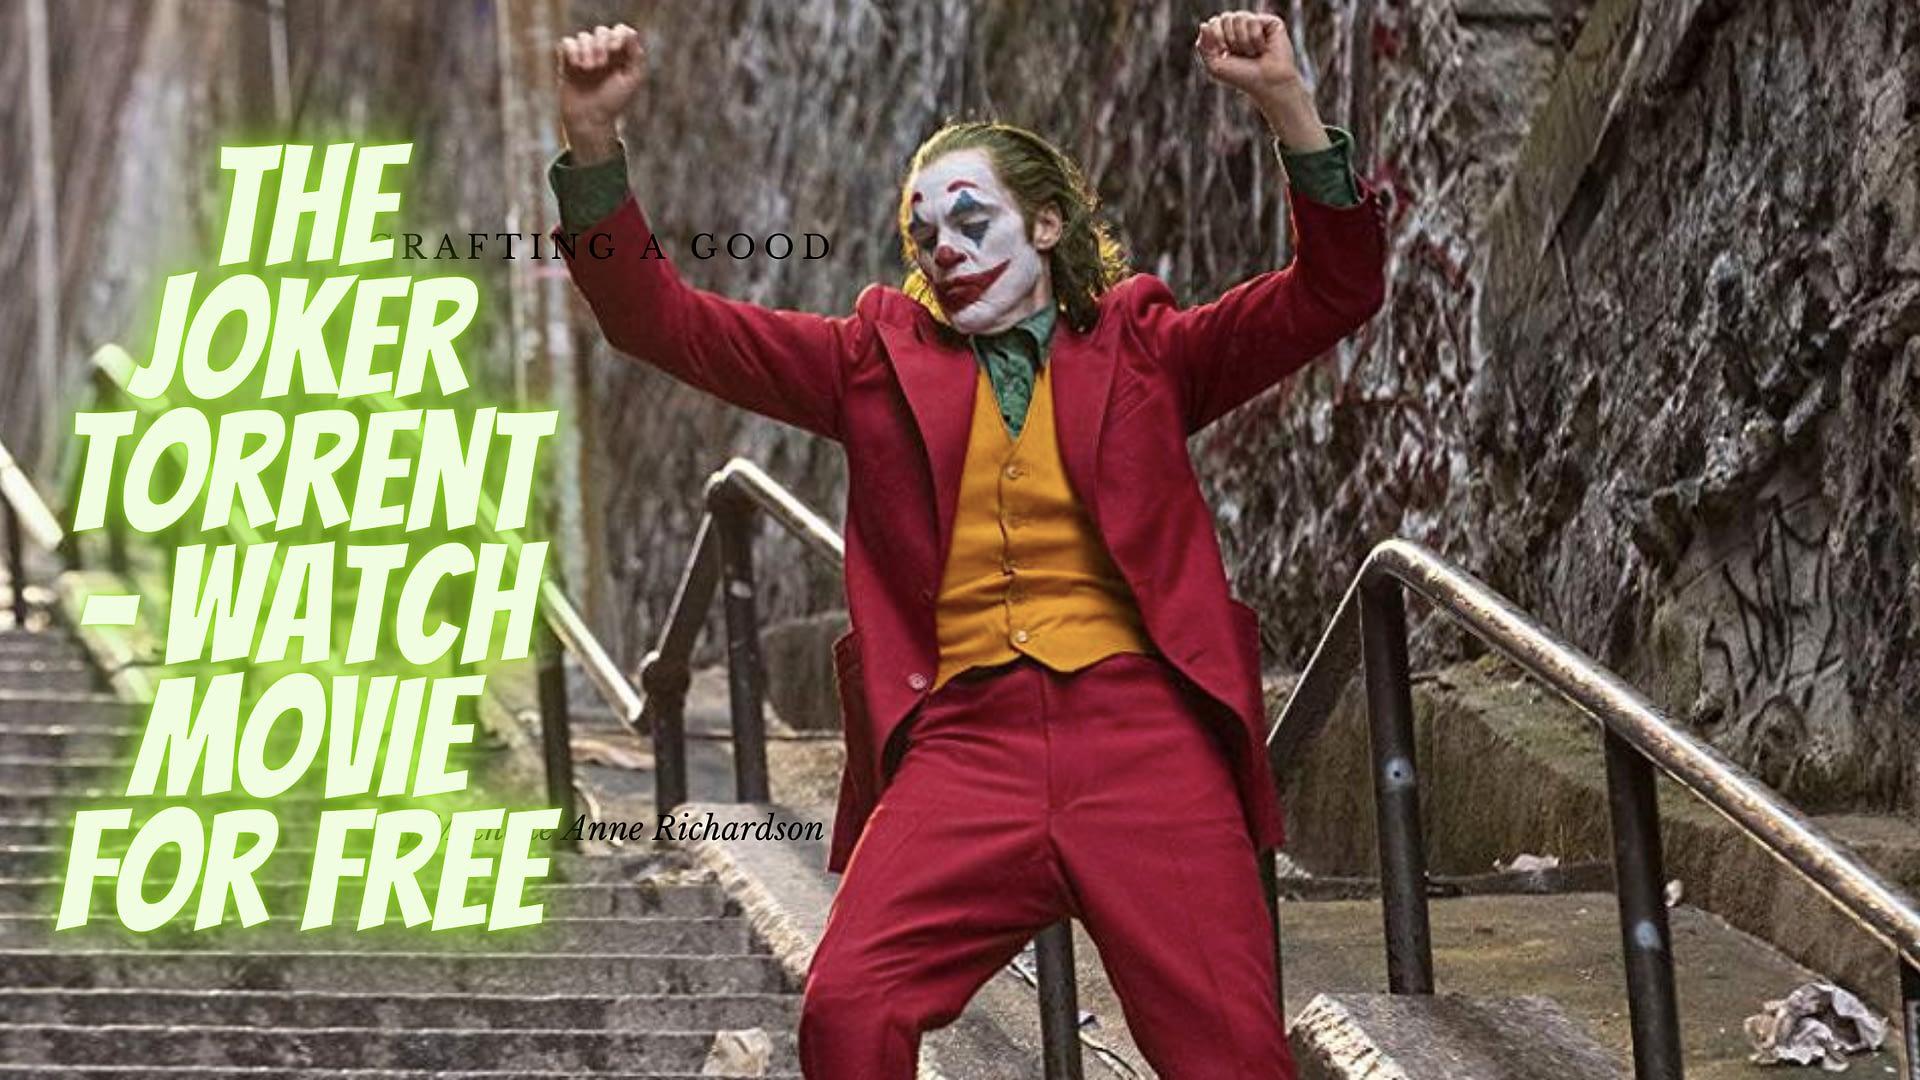 The Joker Torrent – Watch Movie for Free-Thatviralfeedcdn